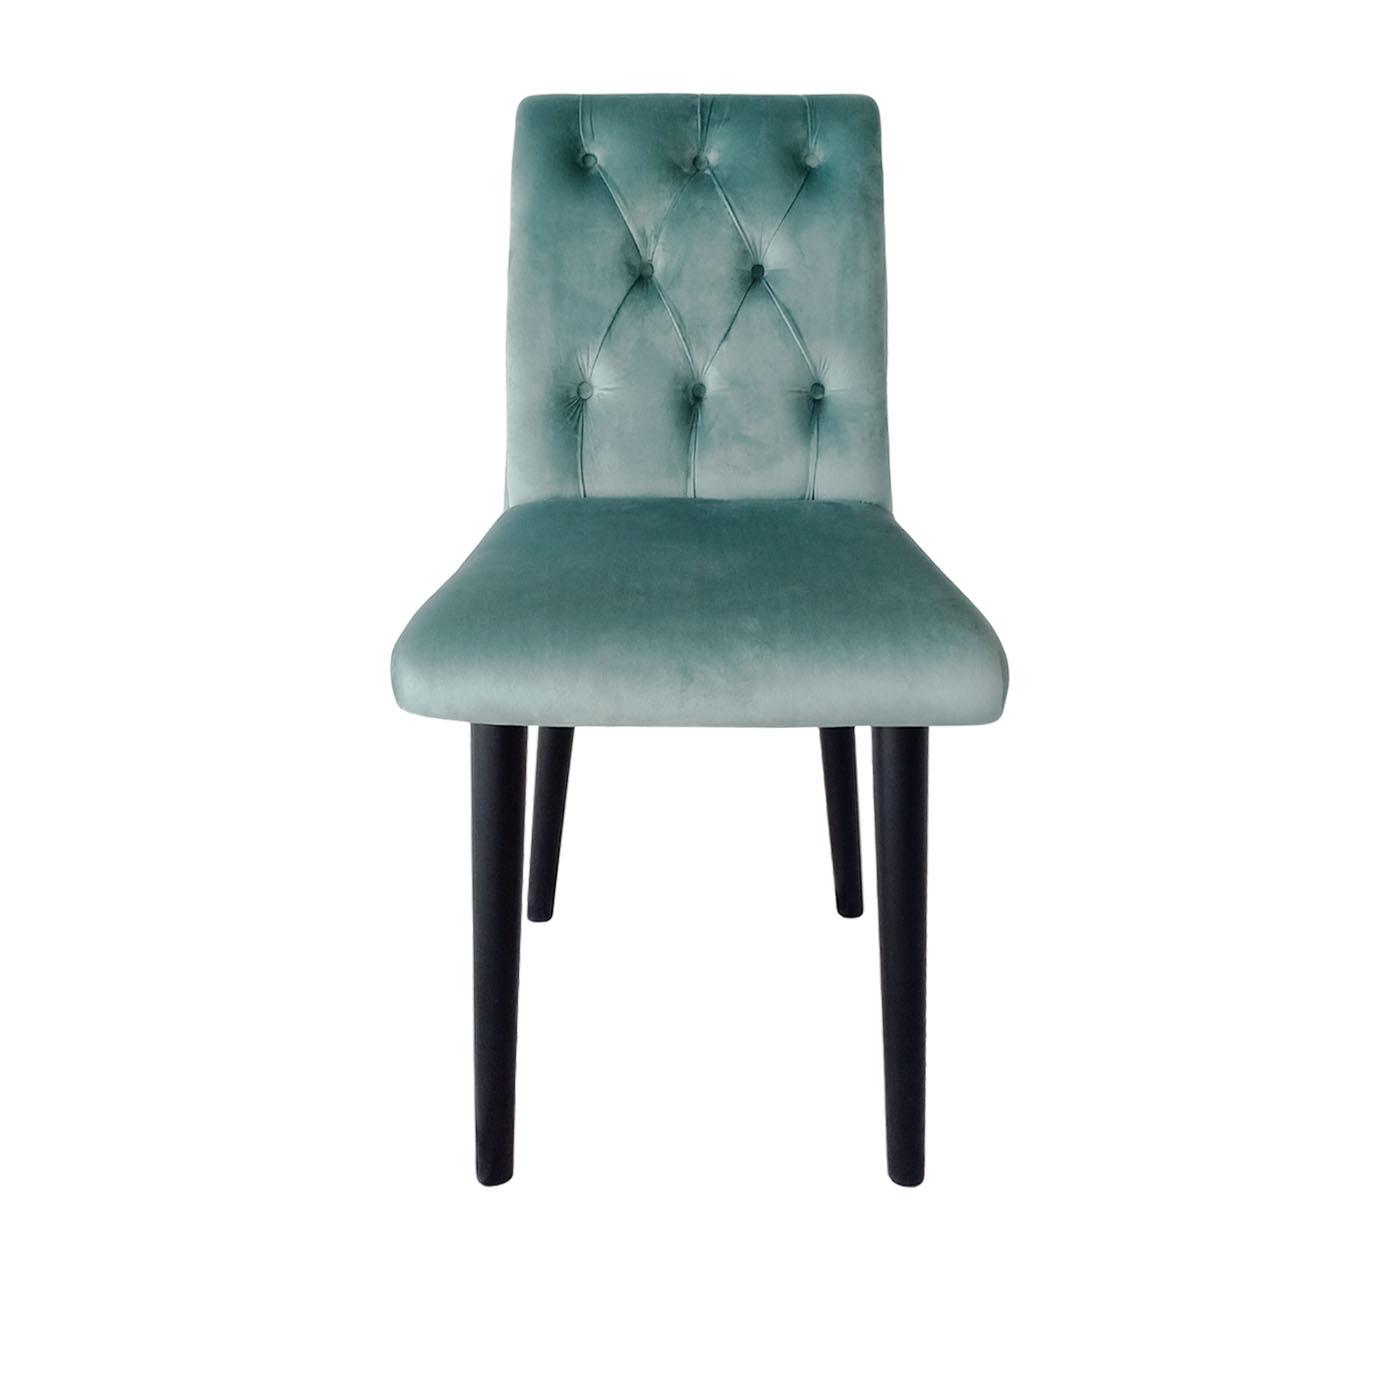 Chesterfield Aqua Green Stitch Black Dining Chair